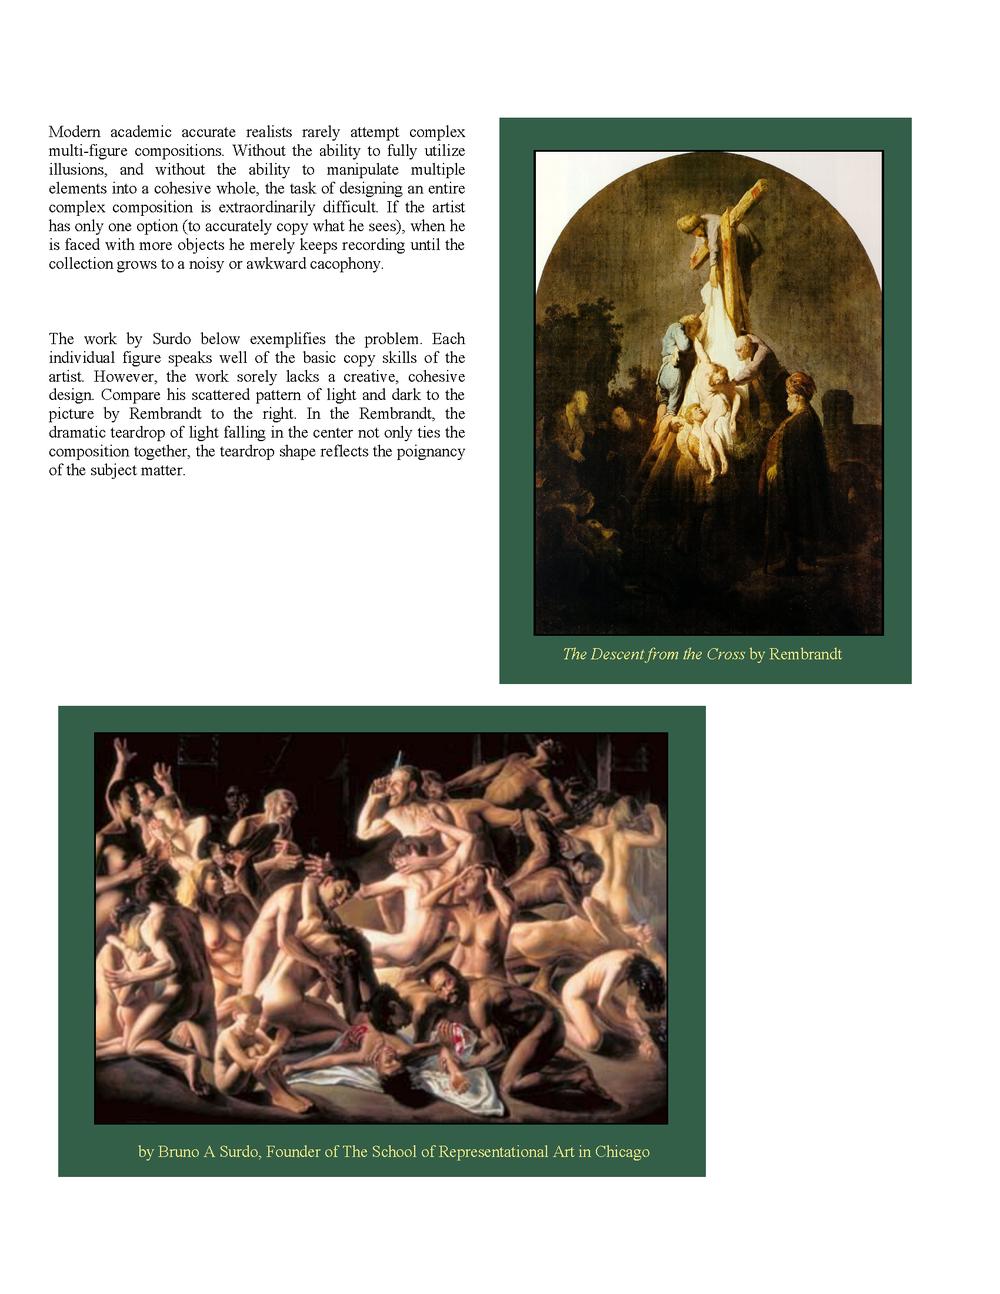 TrinkaMarguaSimonArticle_Page_11.png